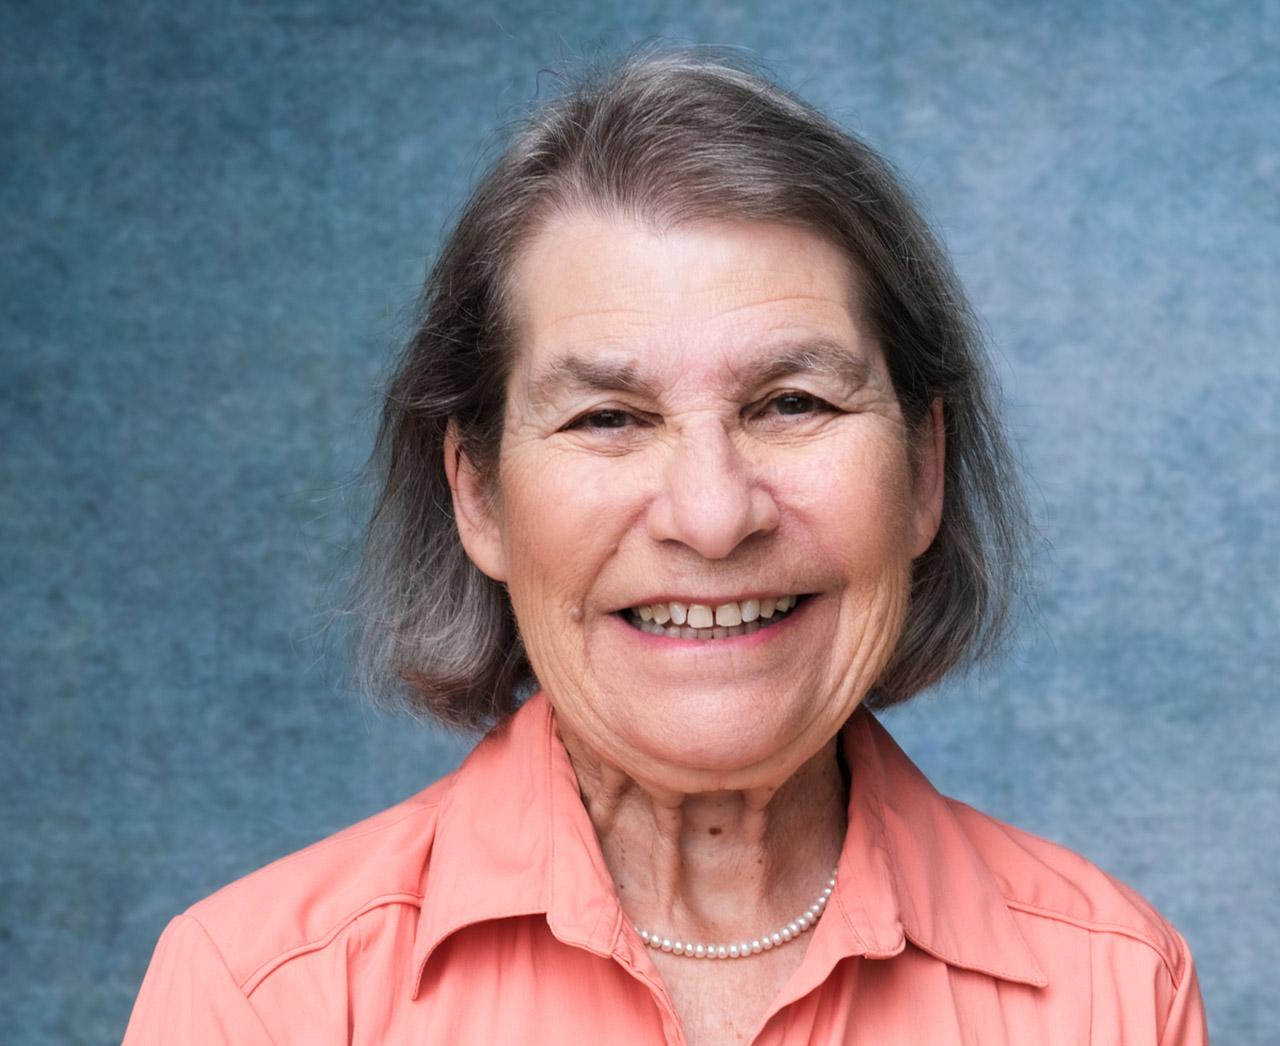 Irene Resnikoff